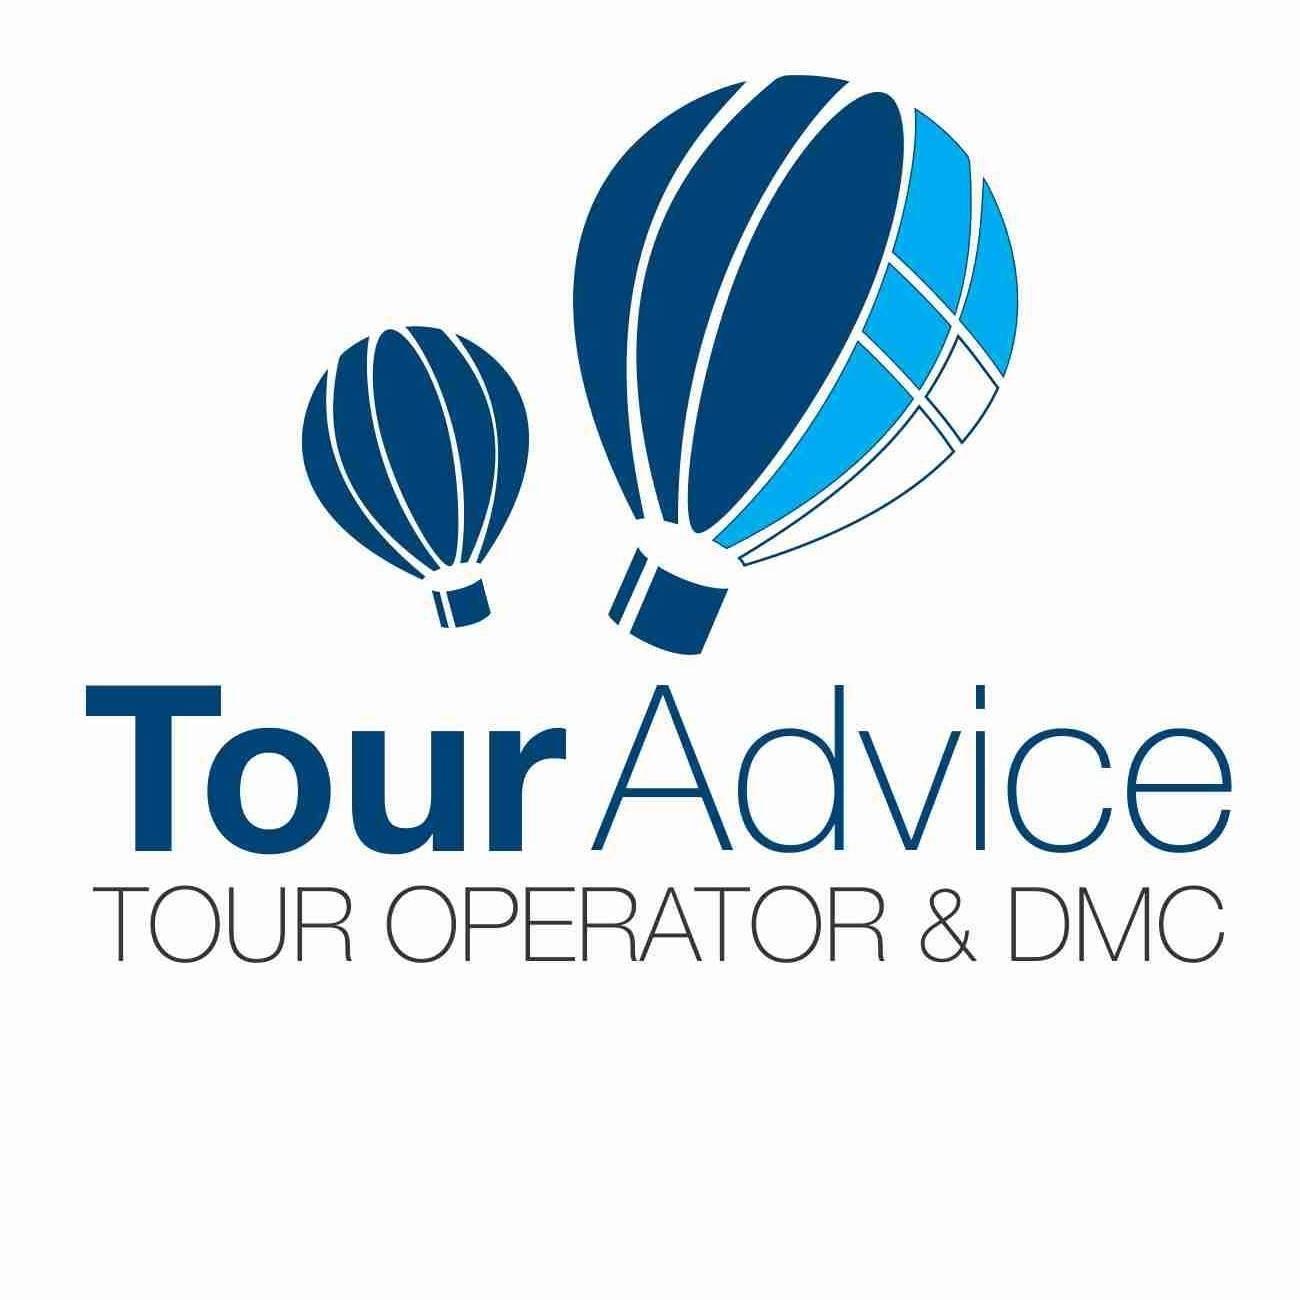 TOUR ADVICE - Tour Operator and DMC